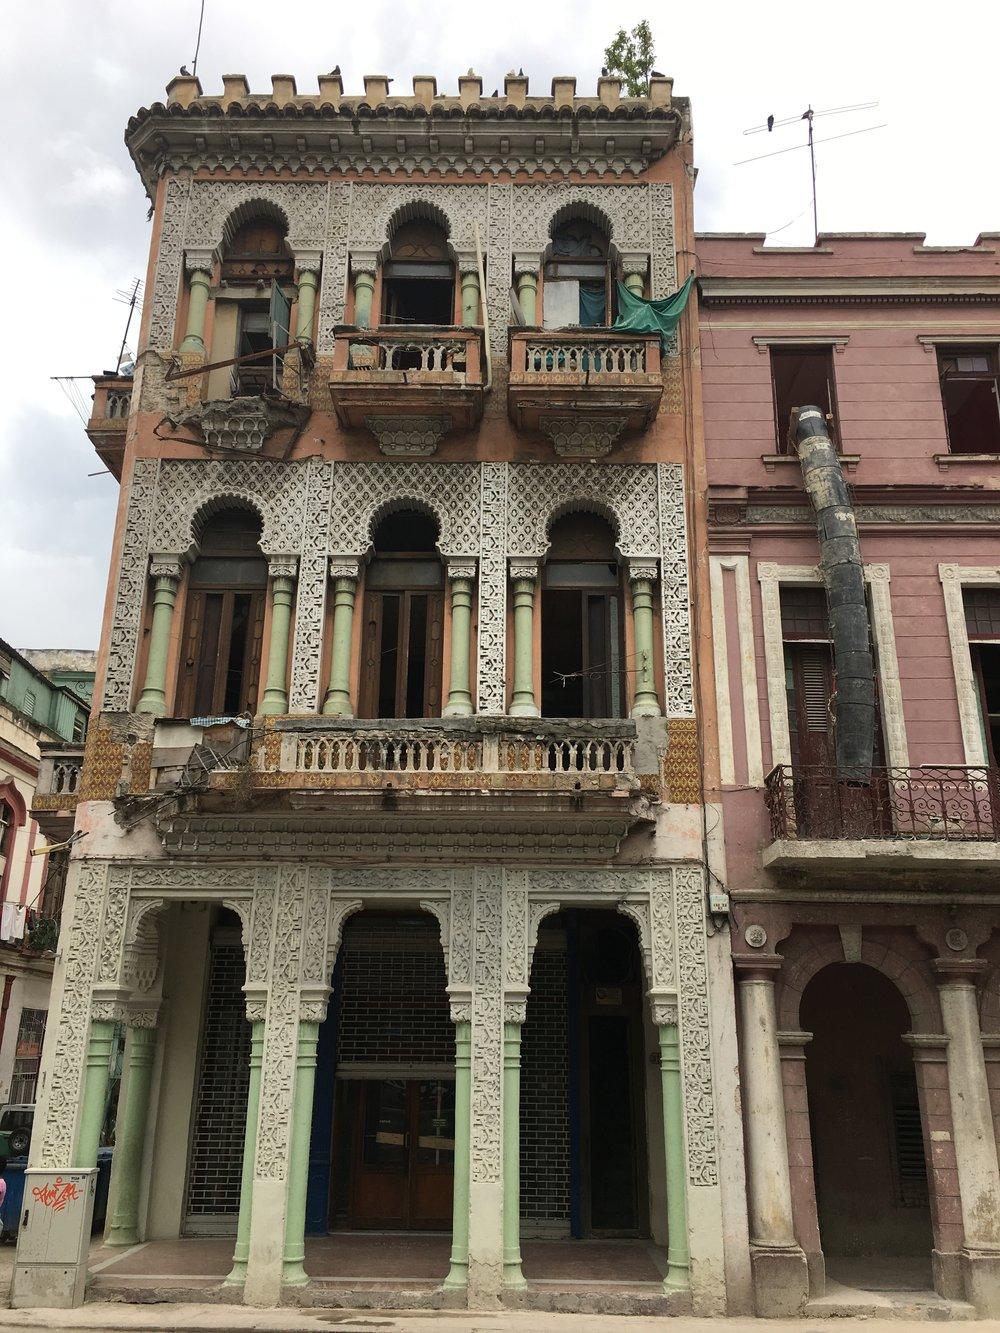 Apartment building in Old Havana